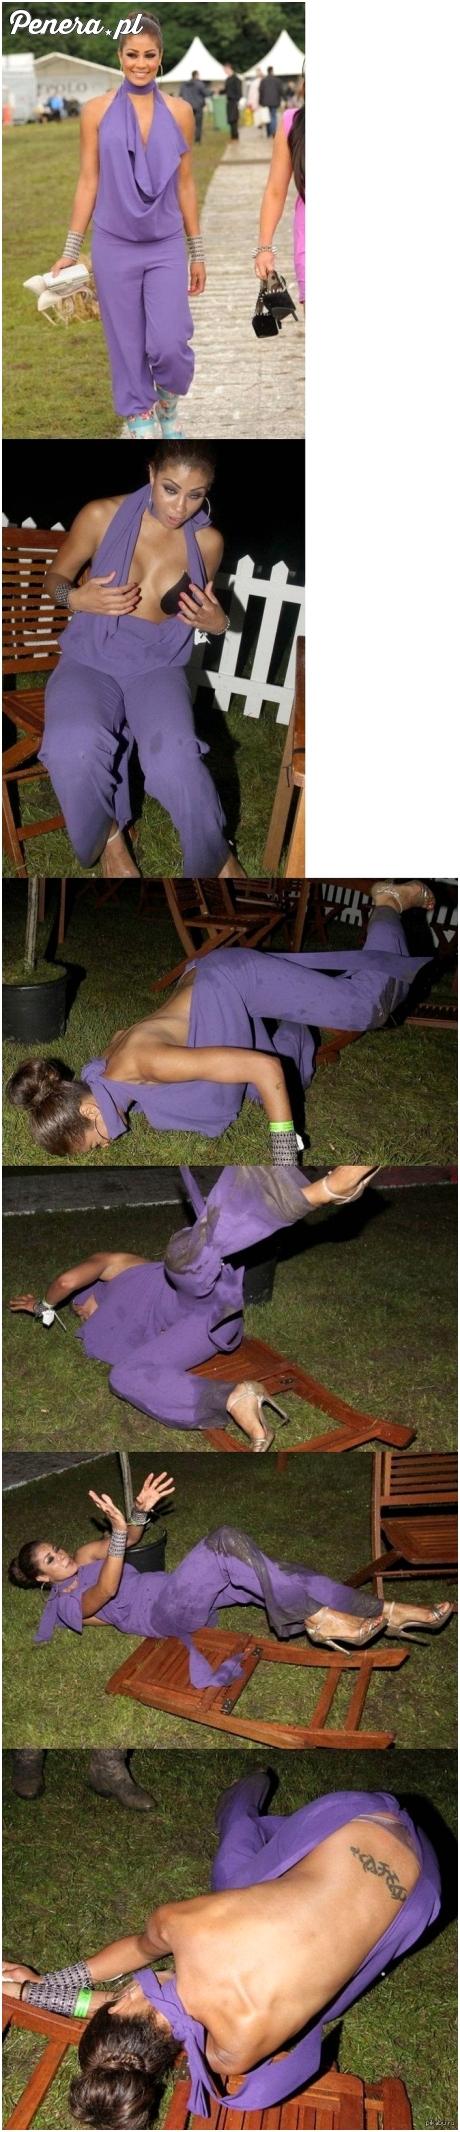 Dama kontra zbyt duża ilość alkoholu!